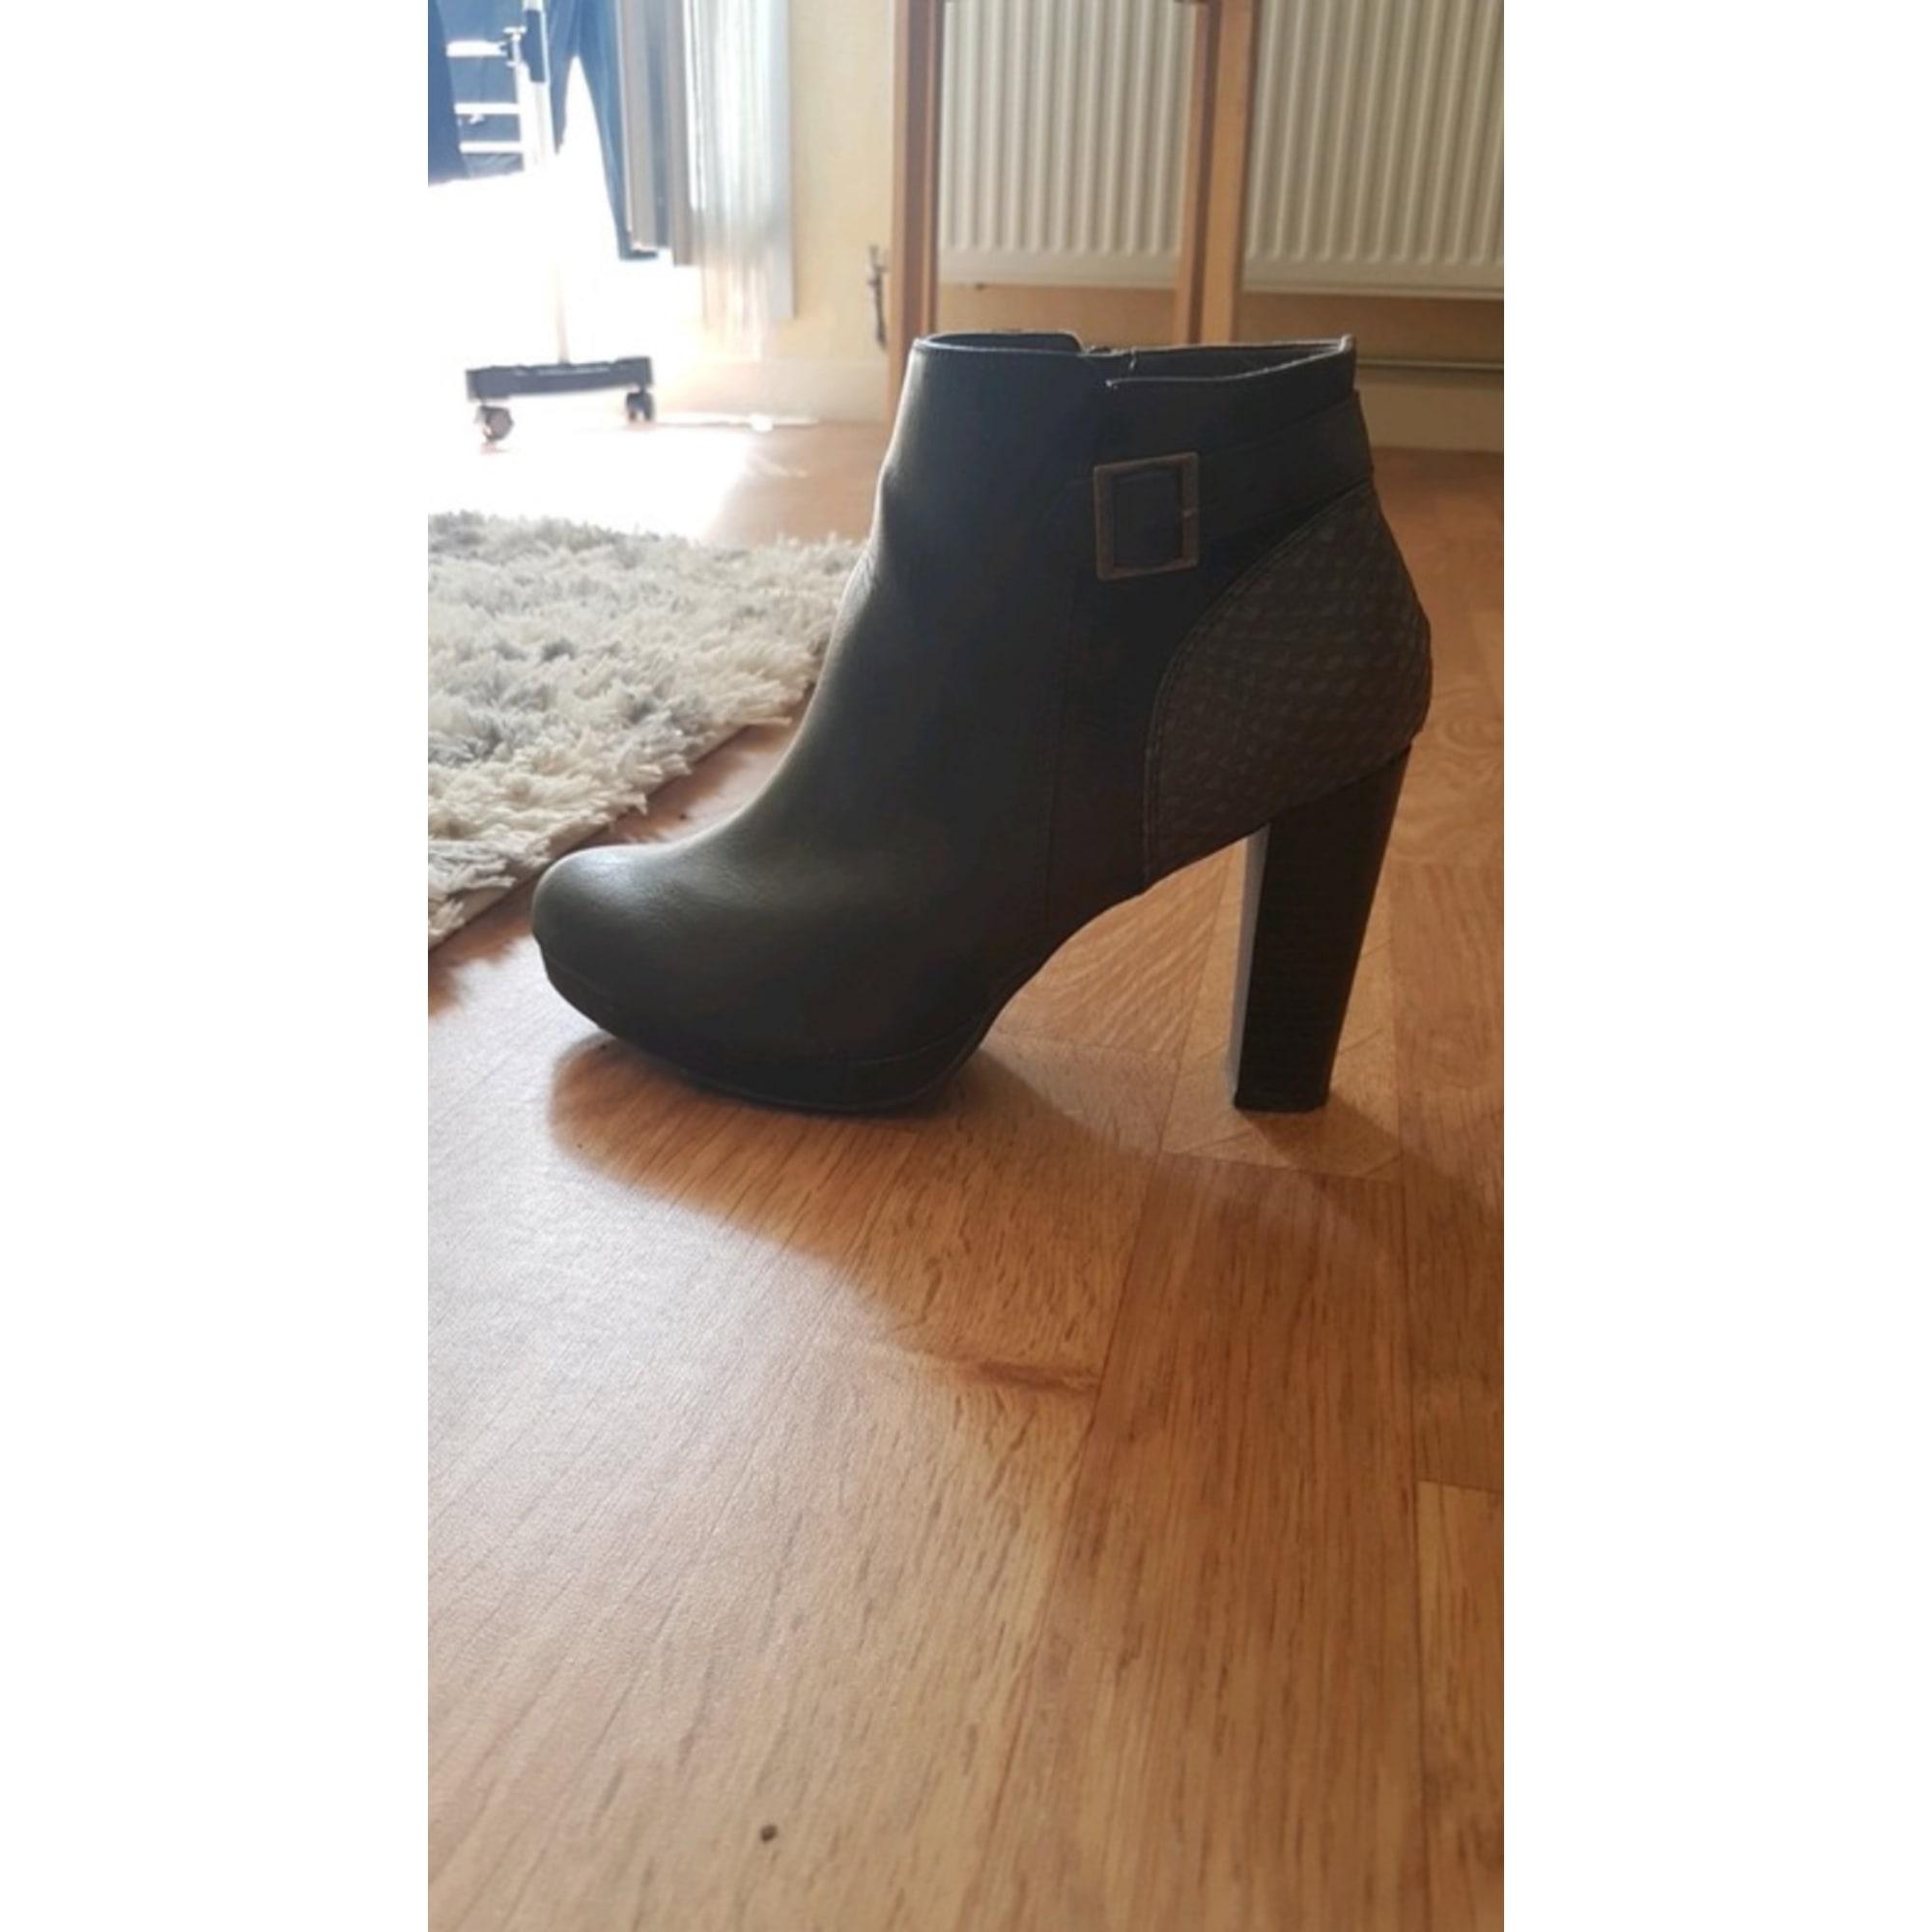 Bottineslow talons boots à Bottineslow talons à à boots à boots Bottineslow Bottineslow boots talons zVpSUM